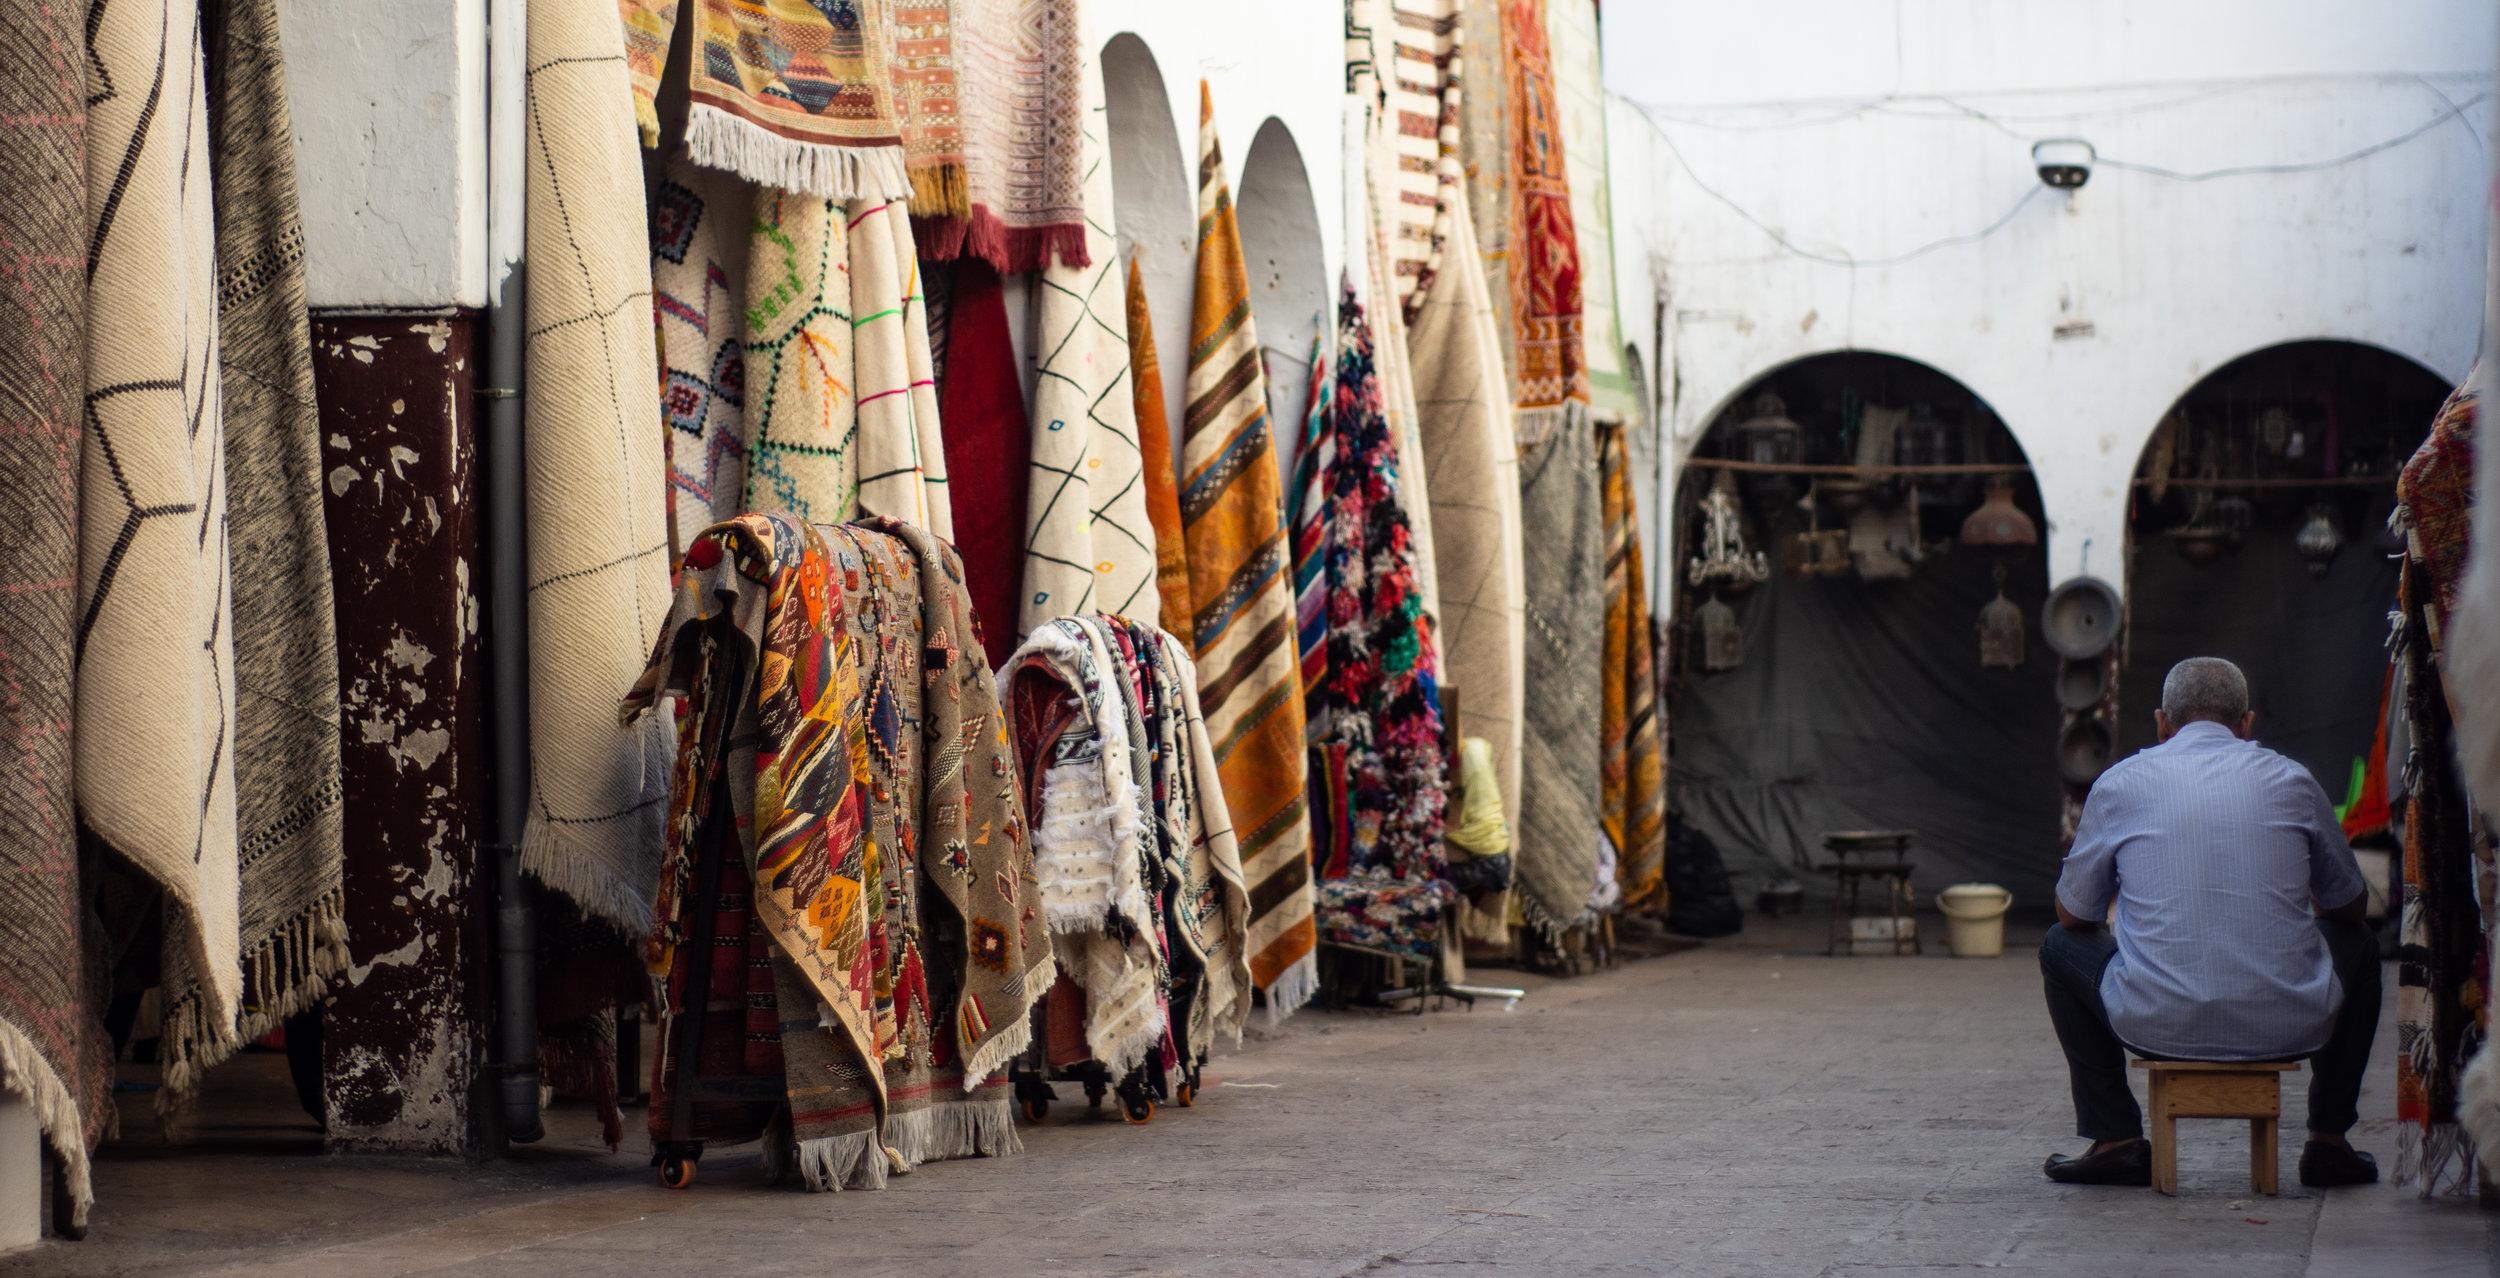 A traditional Berber rug shop